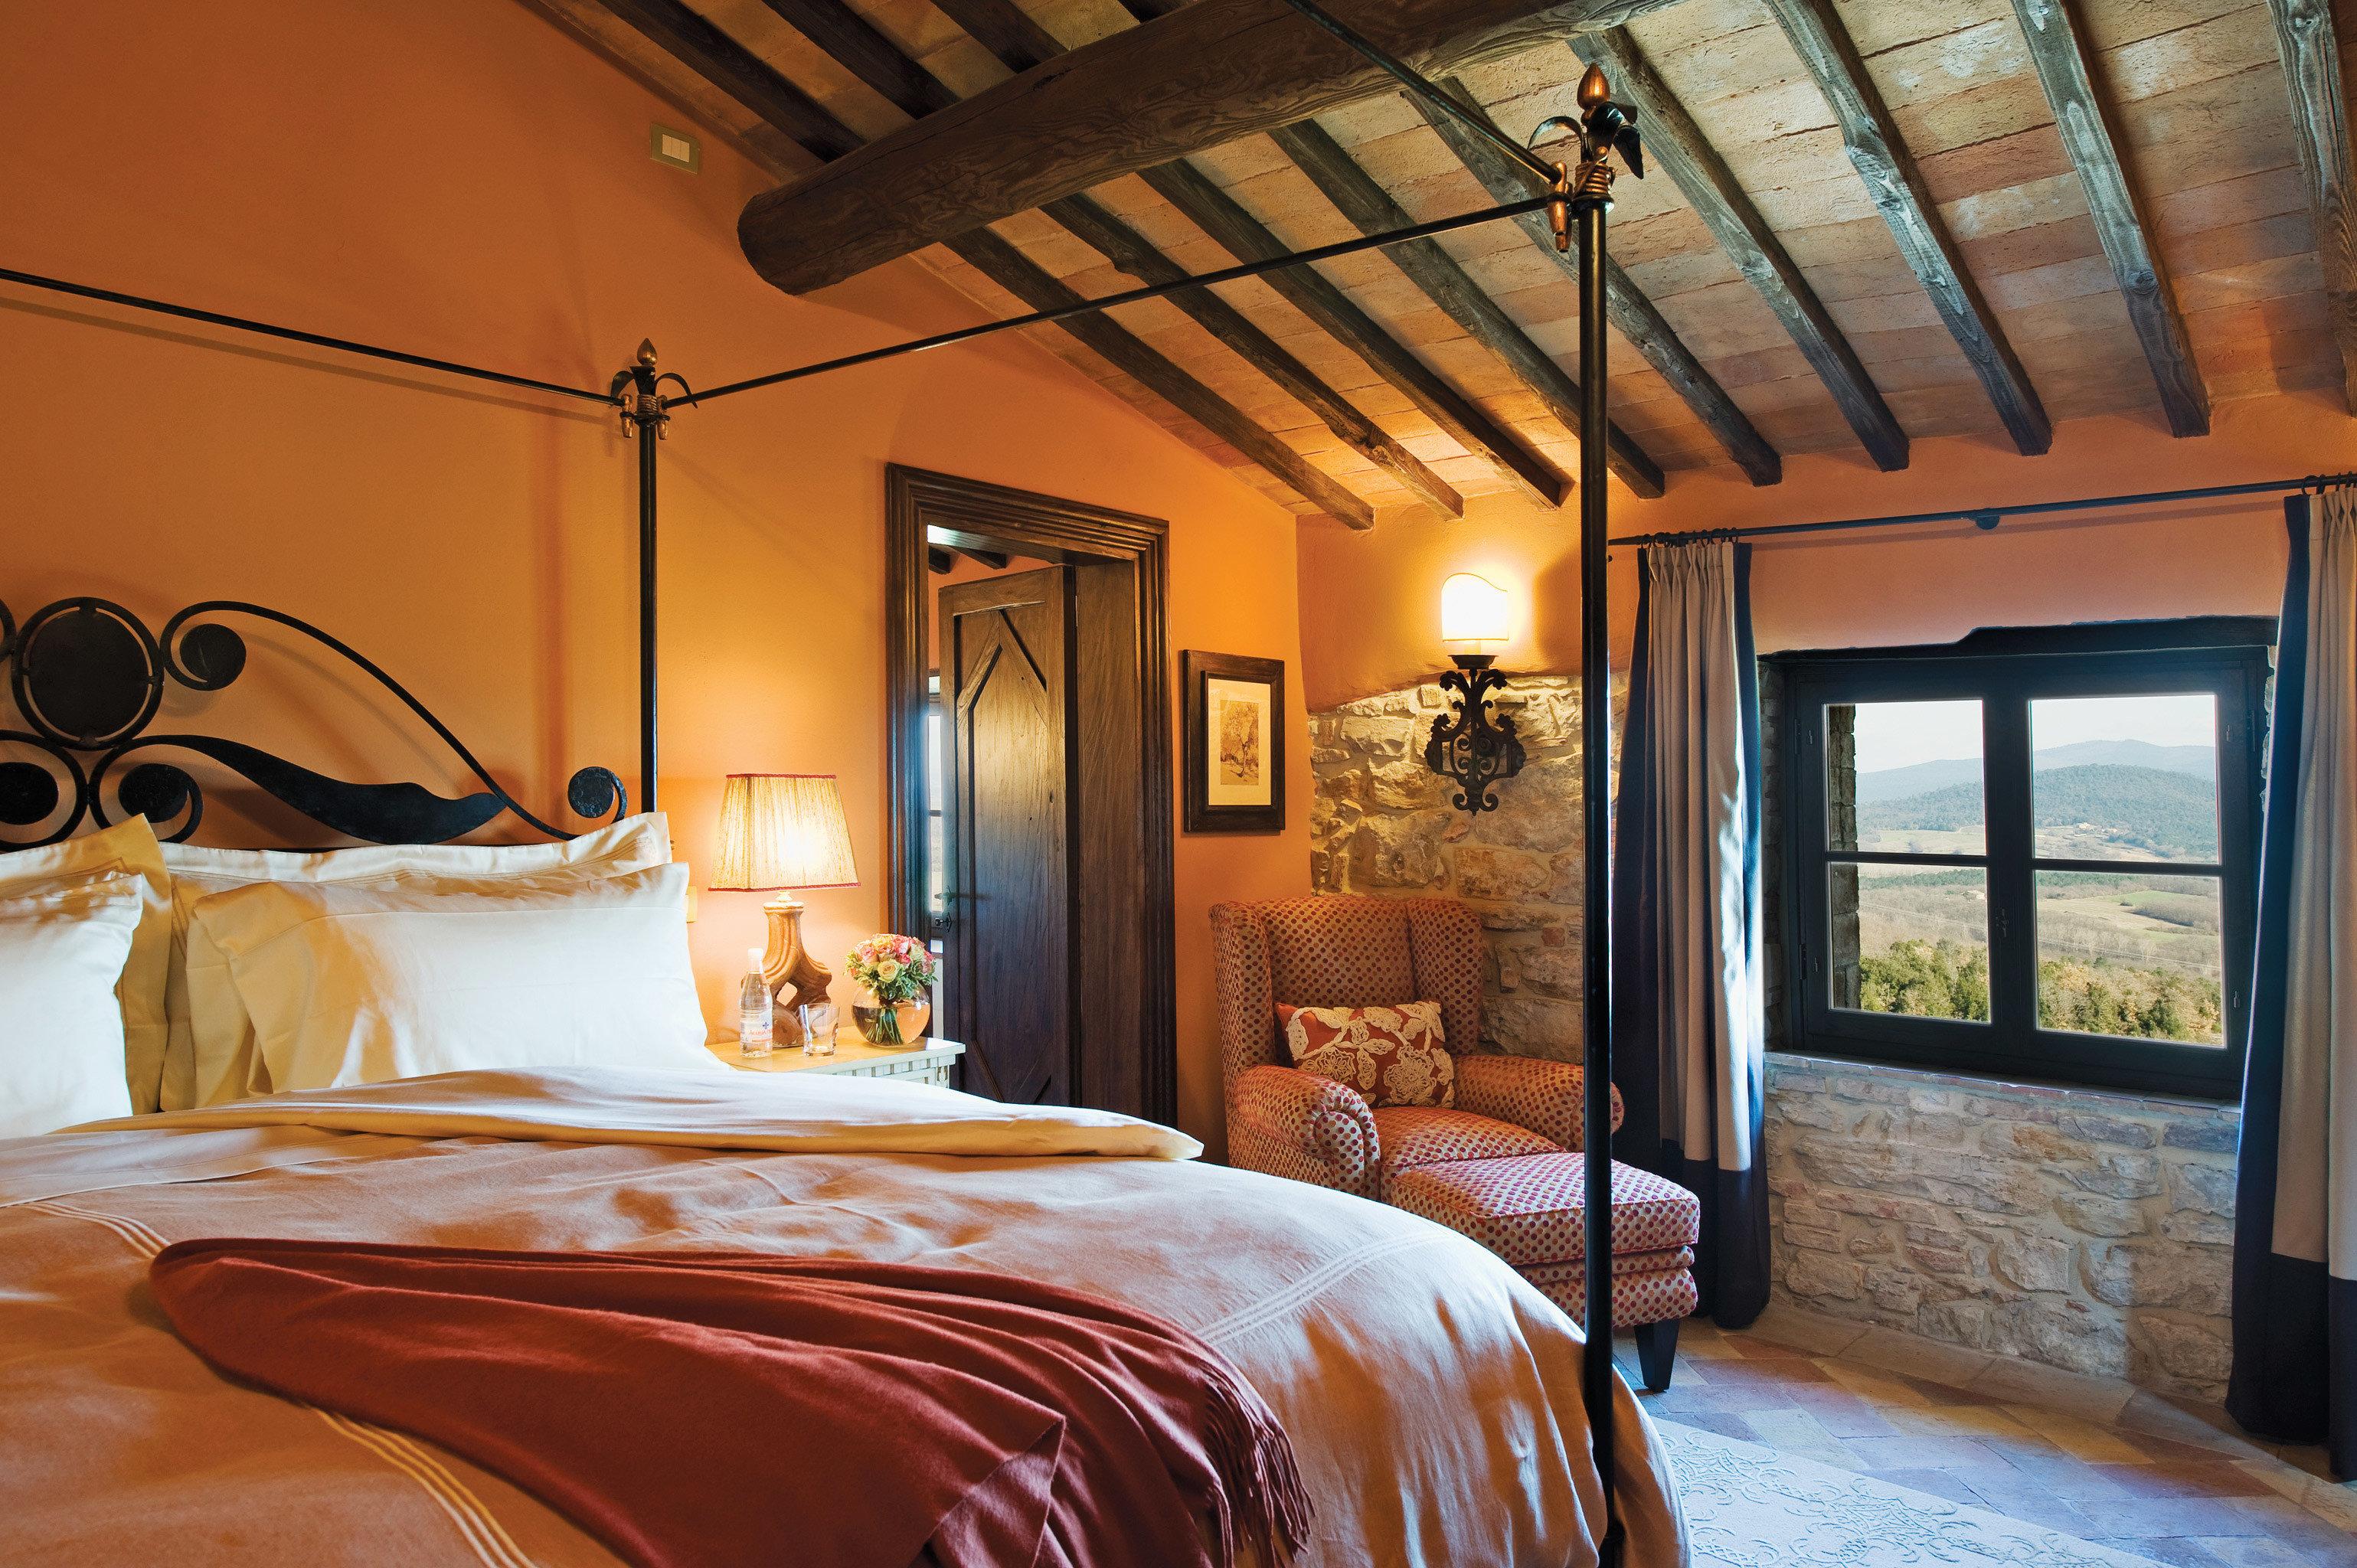 Bedroom Cultural Romance Rustic property home cottage farmhouse Suite Villa living room mansion orange